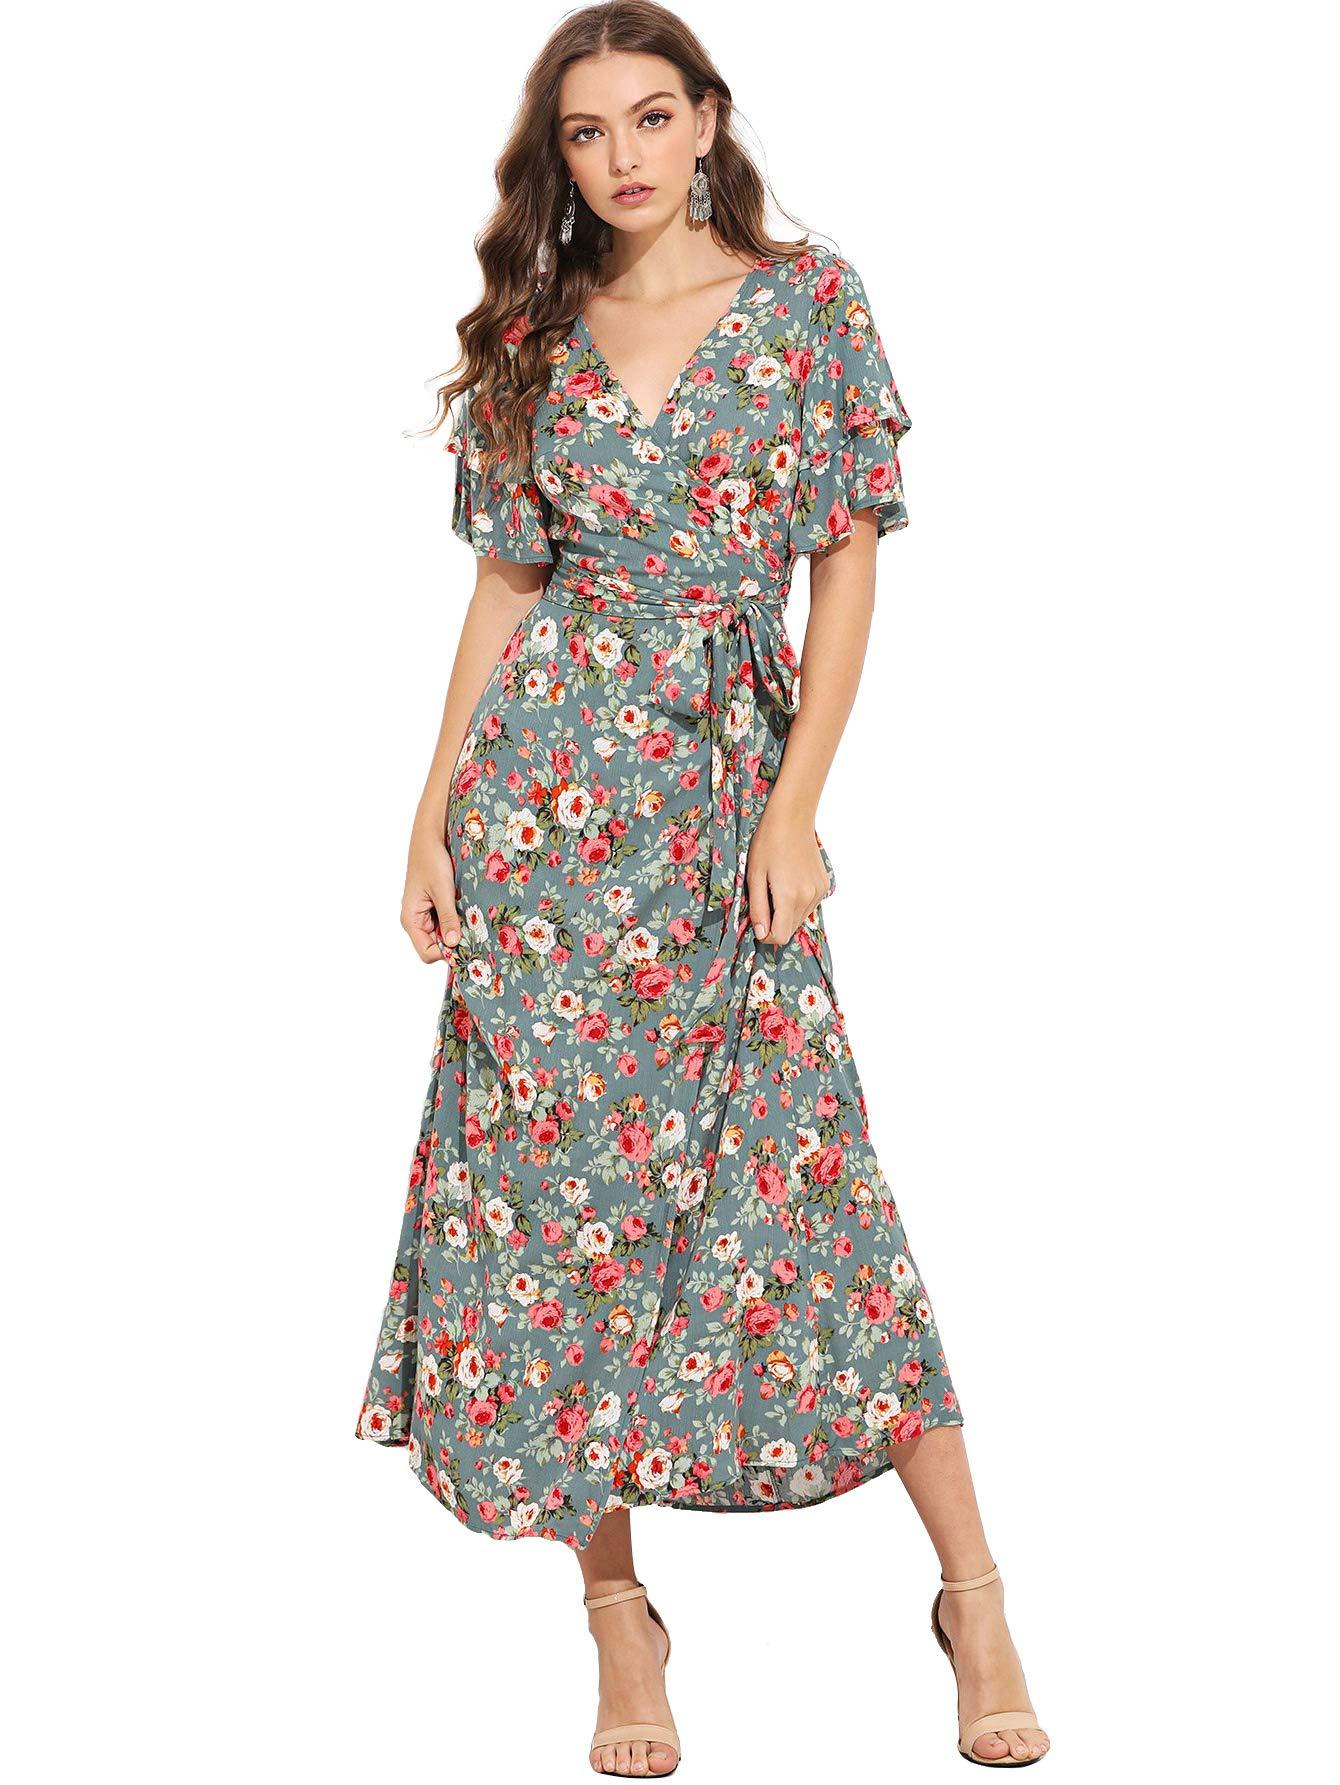 b33bbf0be914 Galleon - Milumia Women s Boho Split Tie-Waist Vintage Print Maxi Dress  Medium Multicolor-2